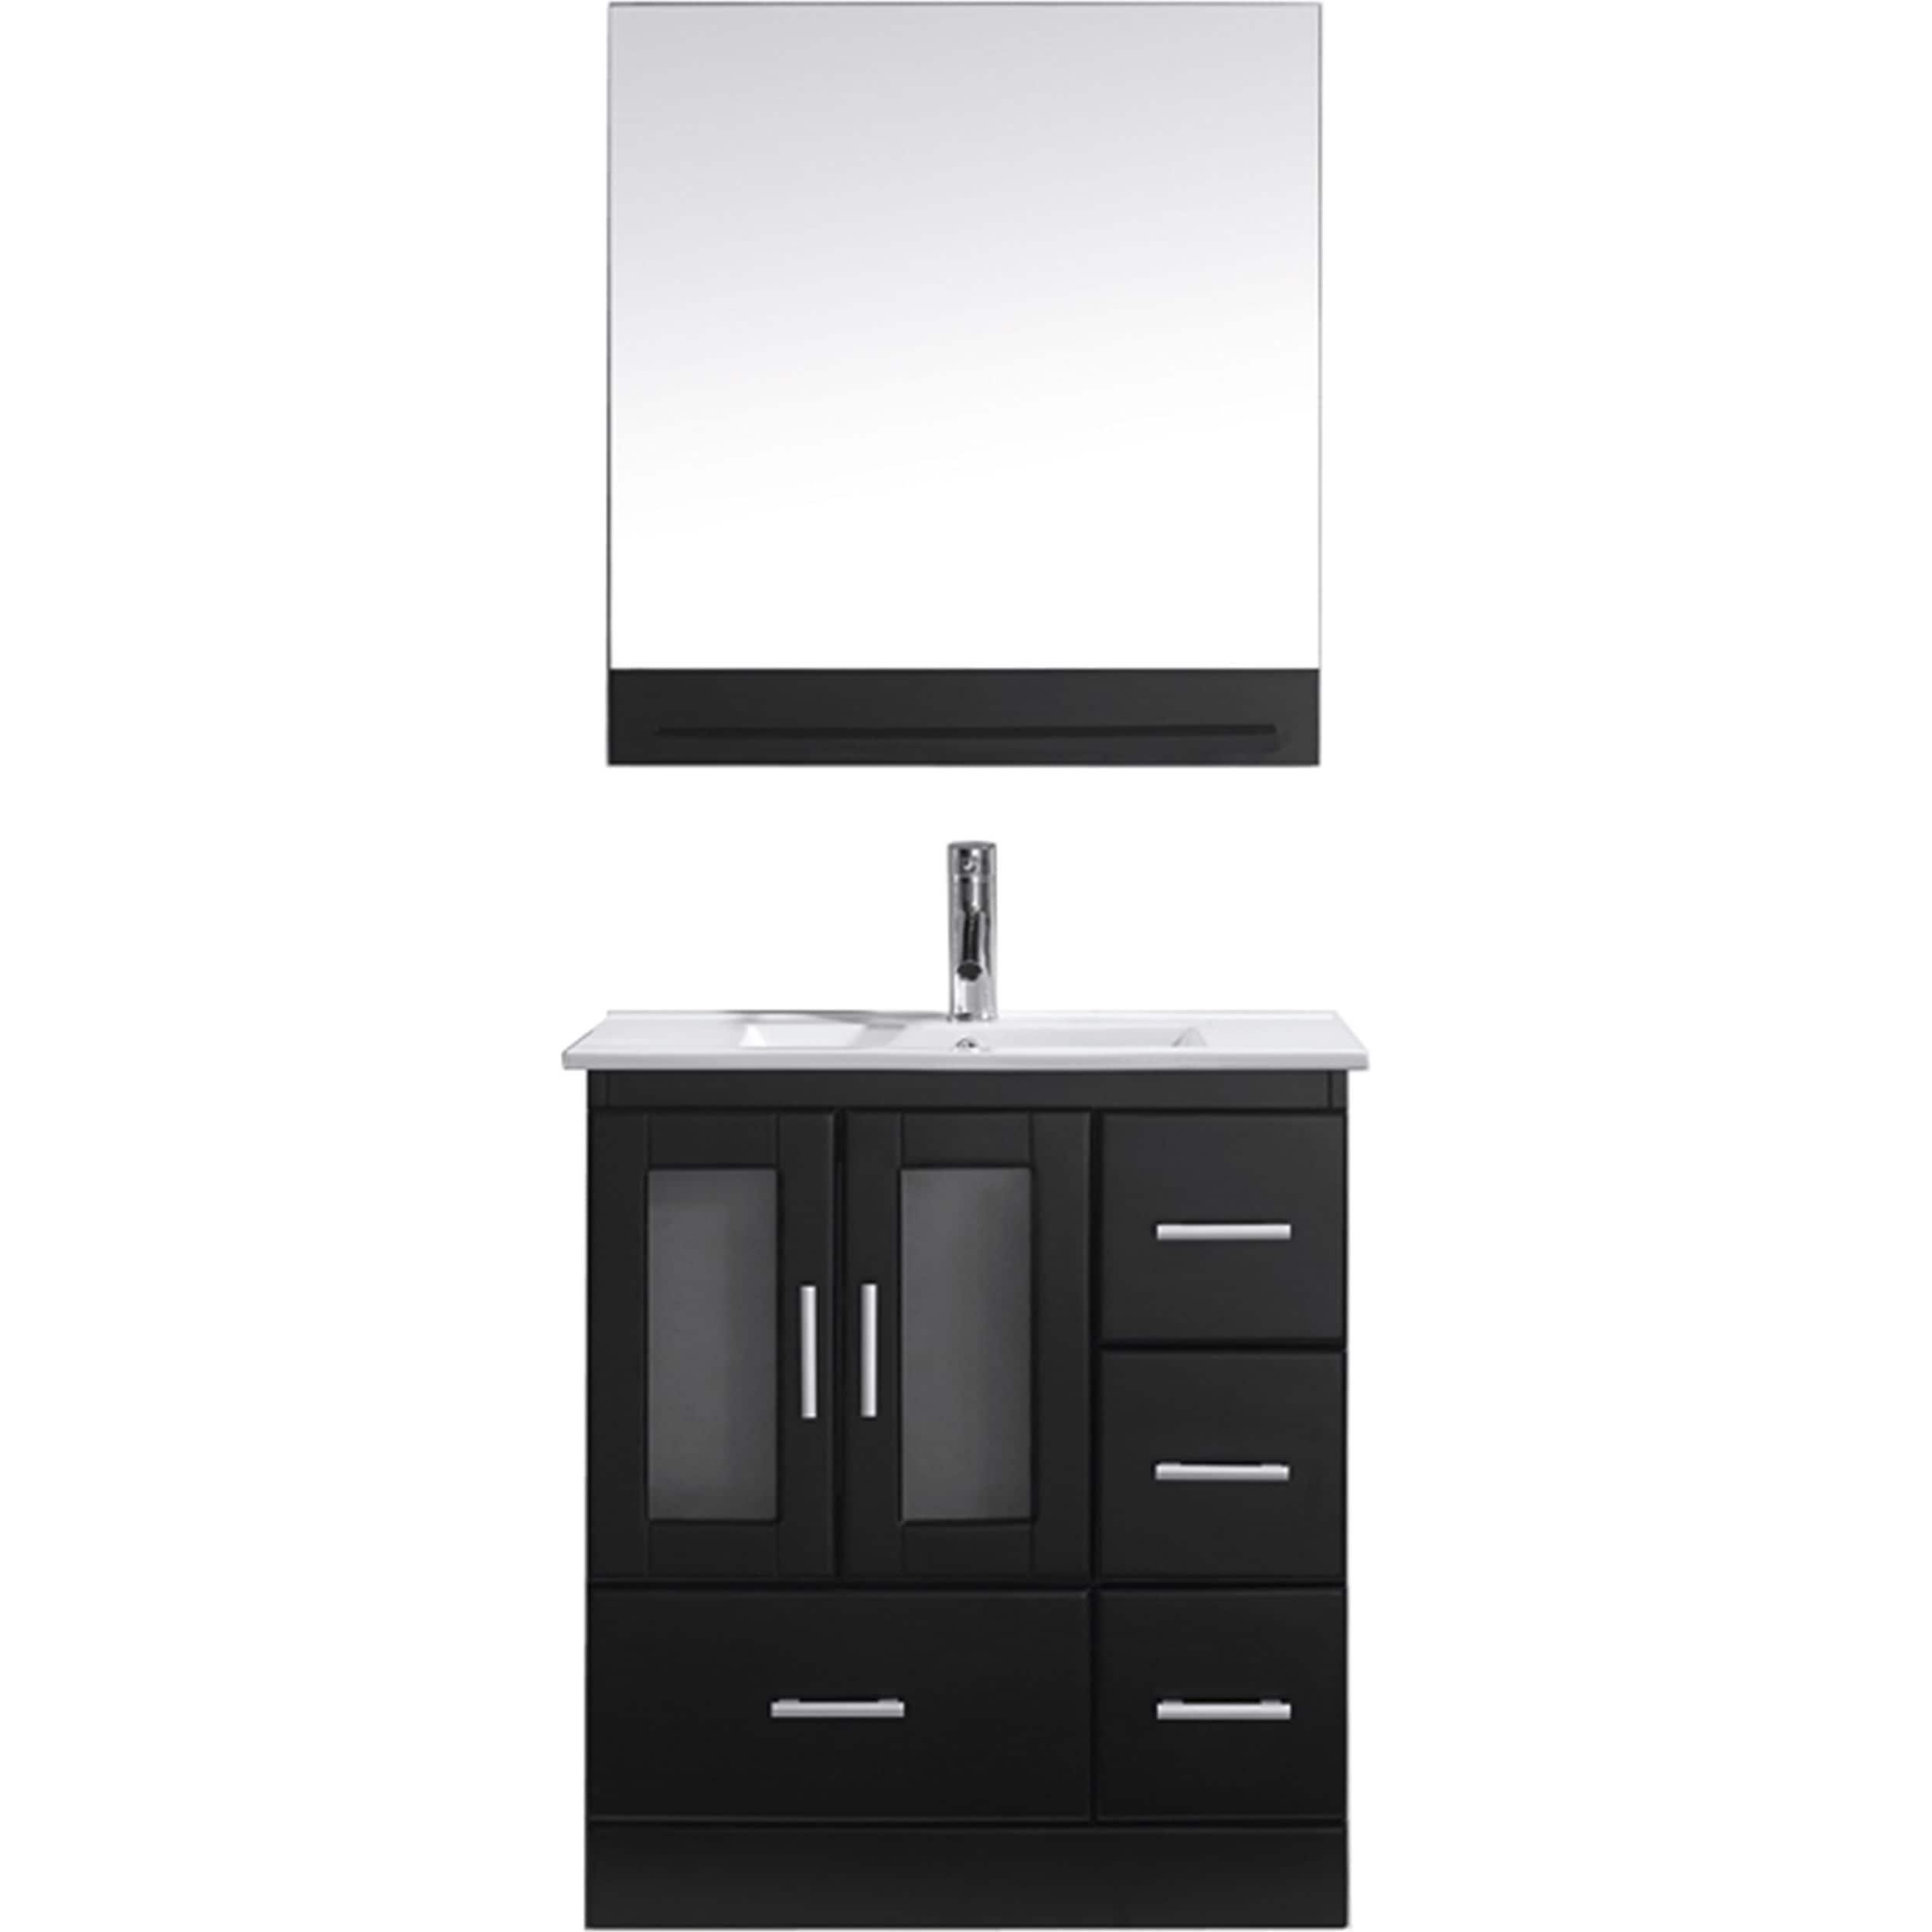 Virtu USA Zola 30-inch Single Bathroom Vanity Set with Faucet and ...